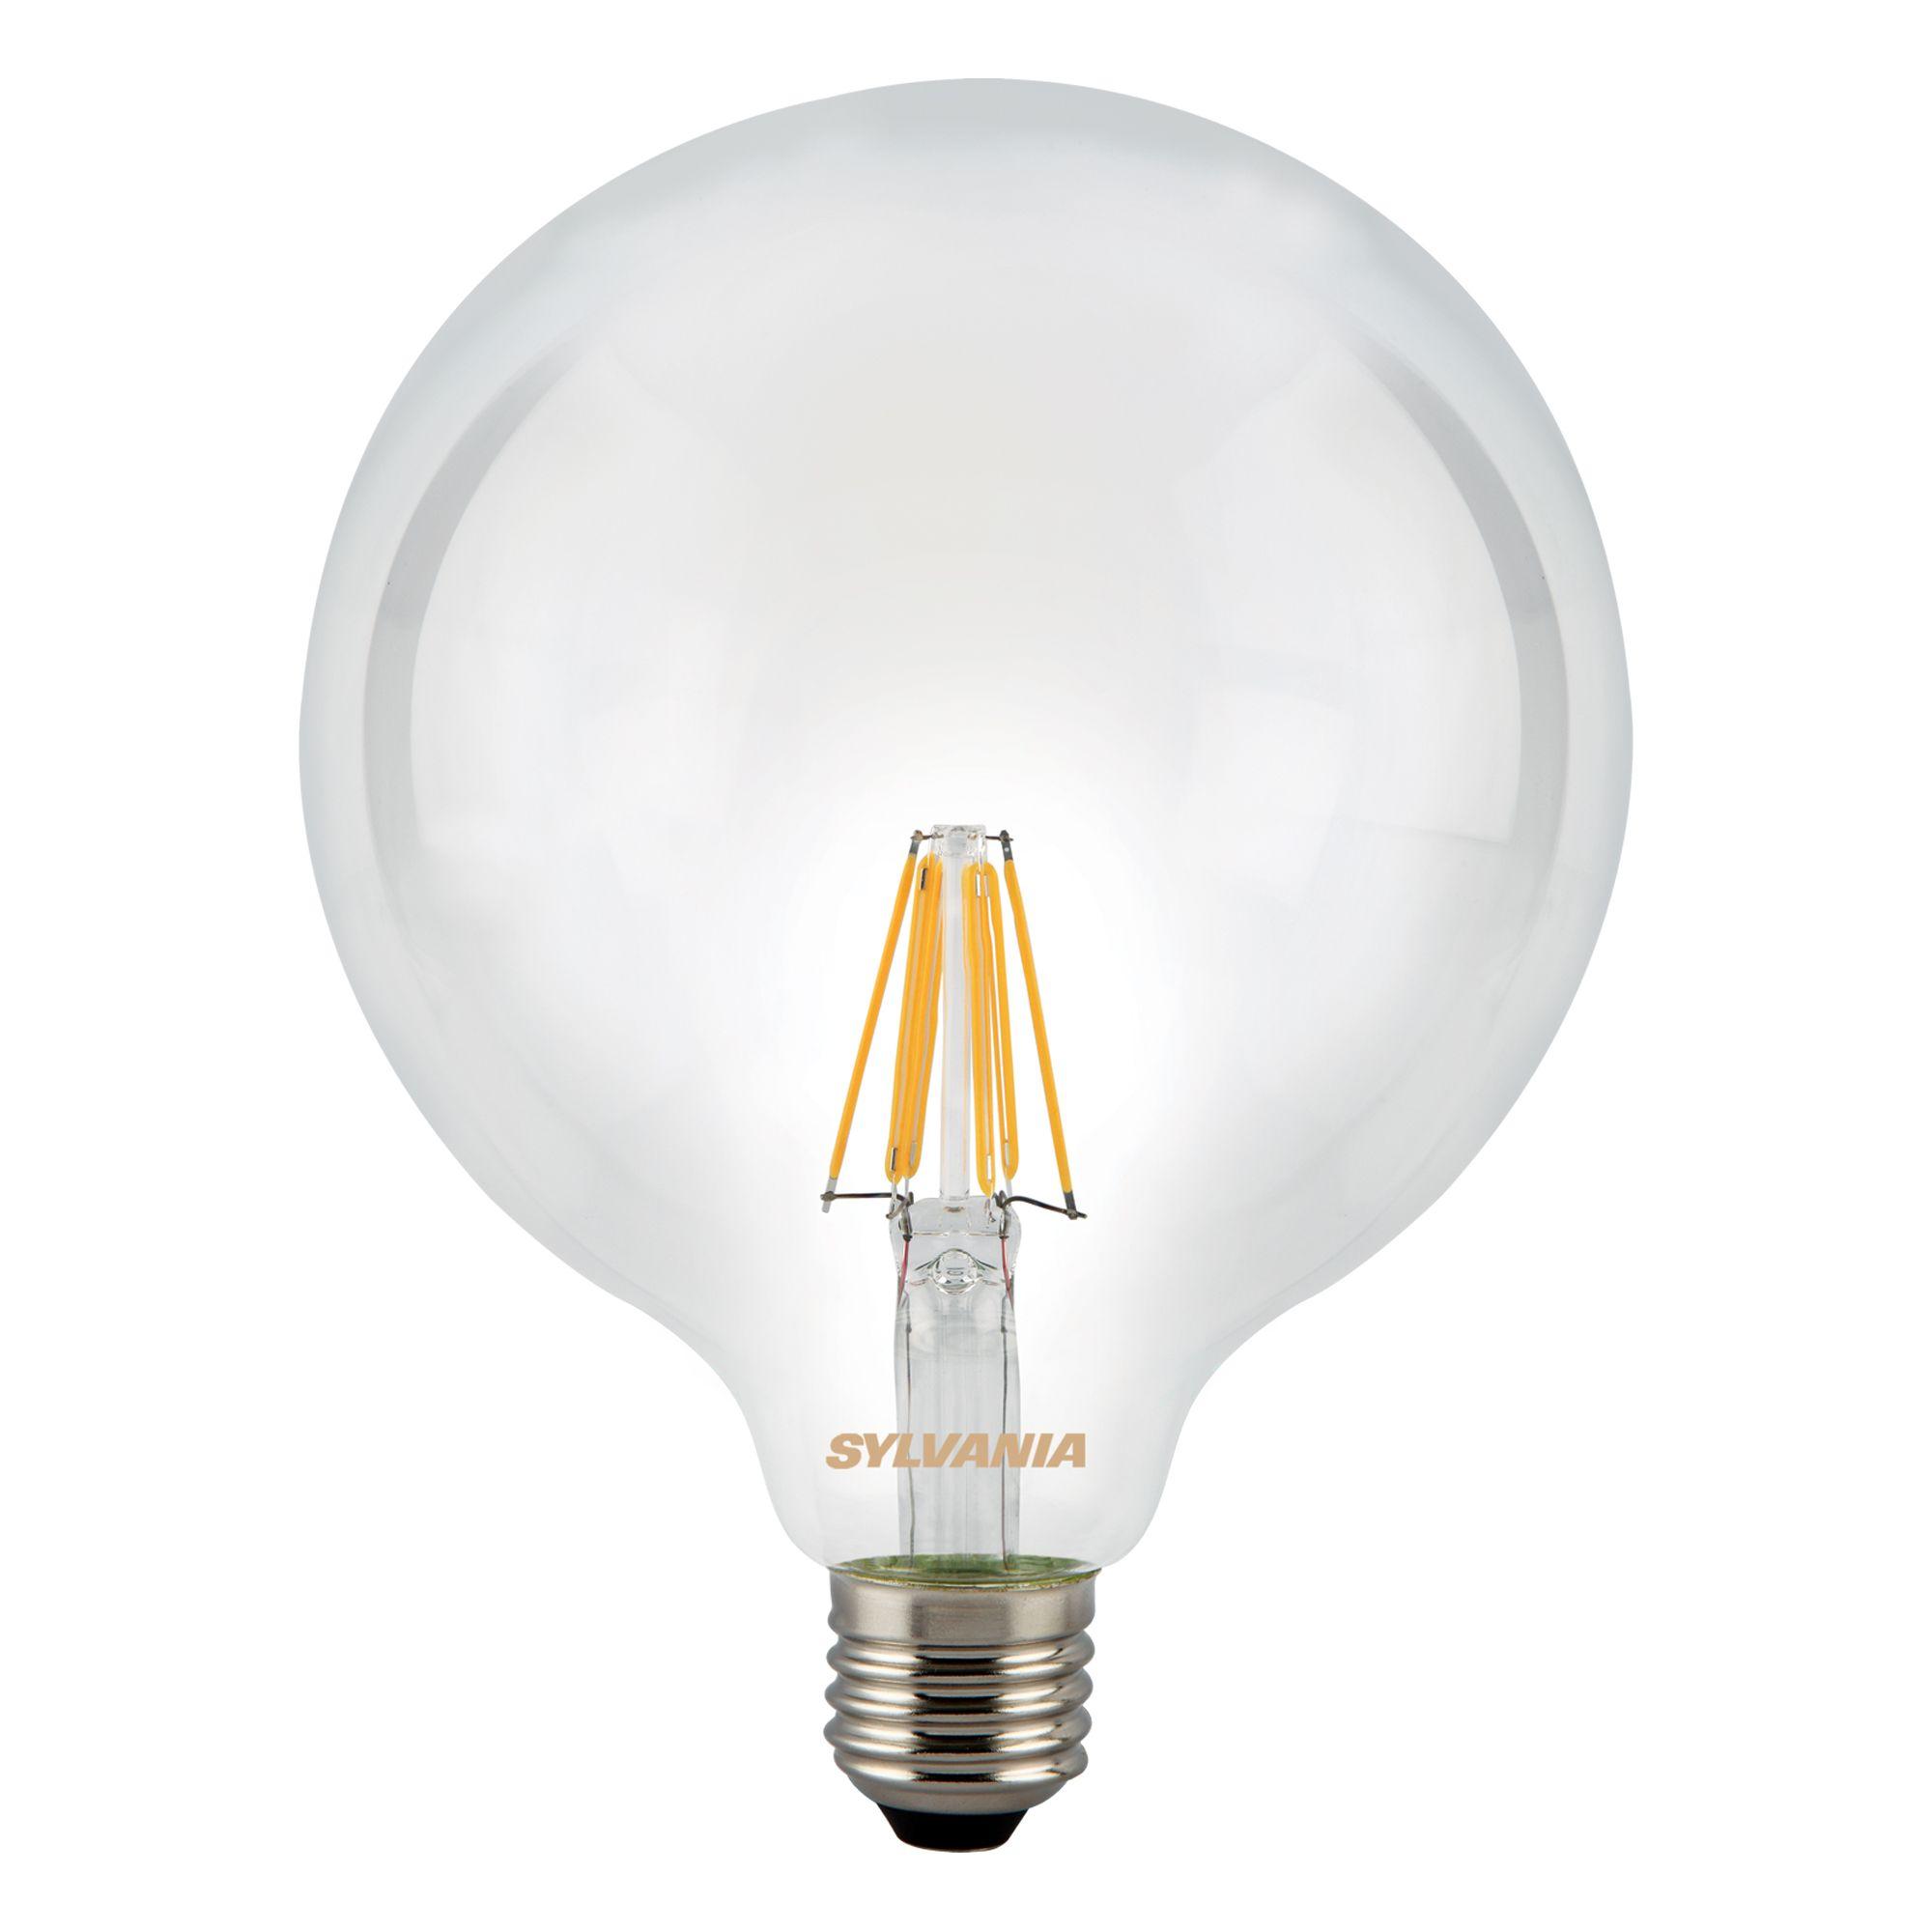 diall edison screw cap e27 28w halogen round light bulb. Black Bedroom Furniture Sets. Home Design Ideas